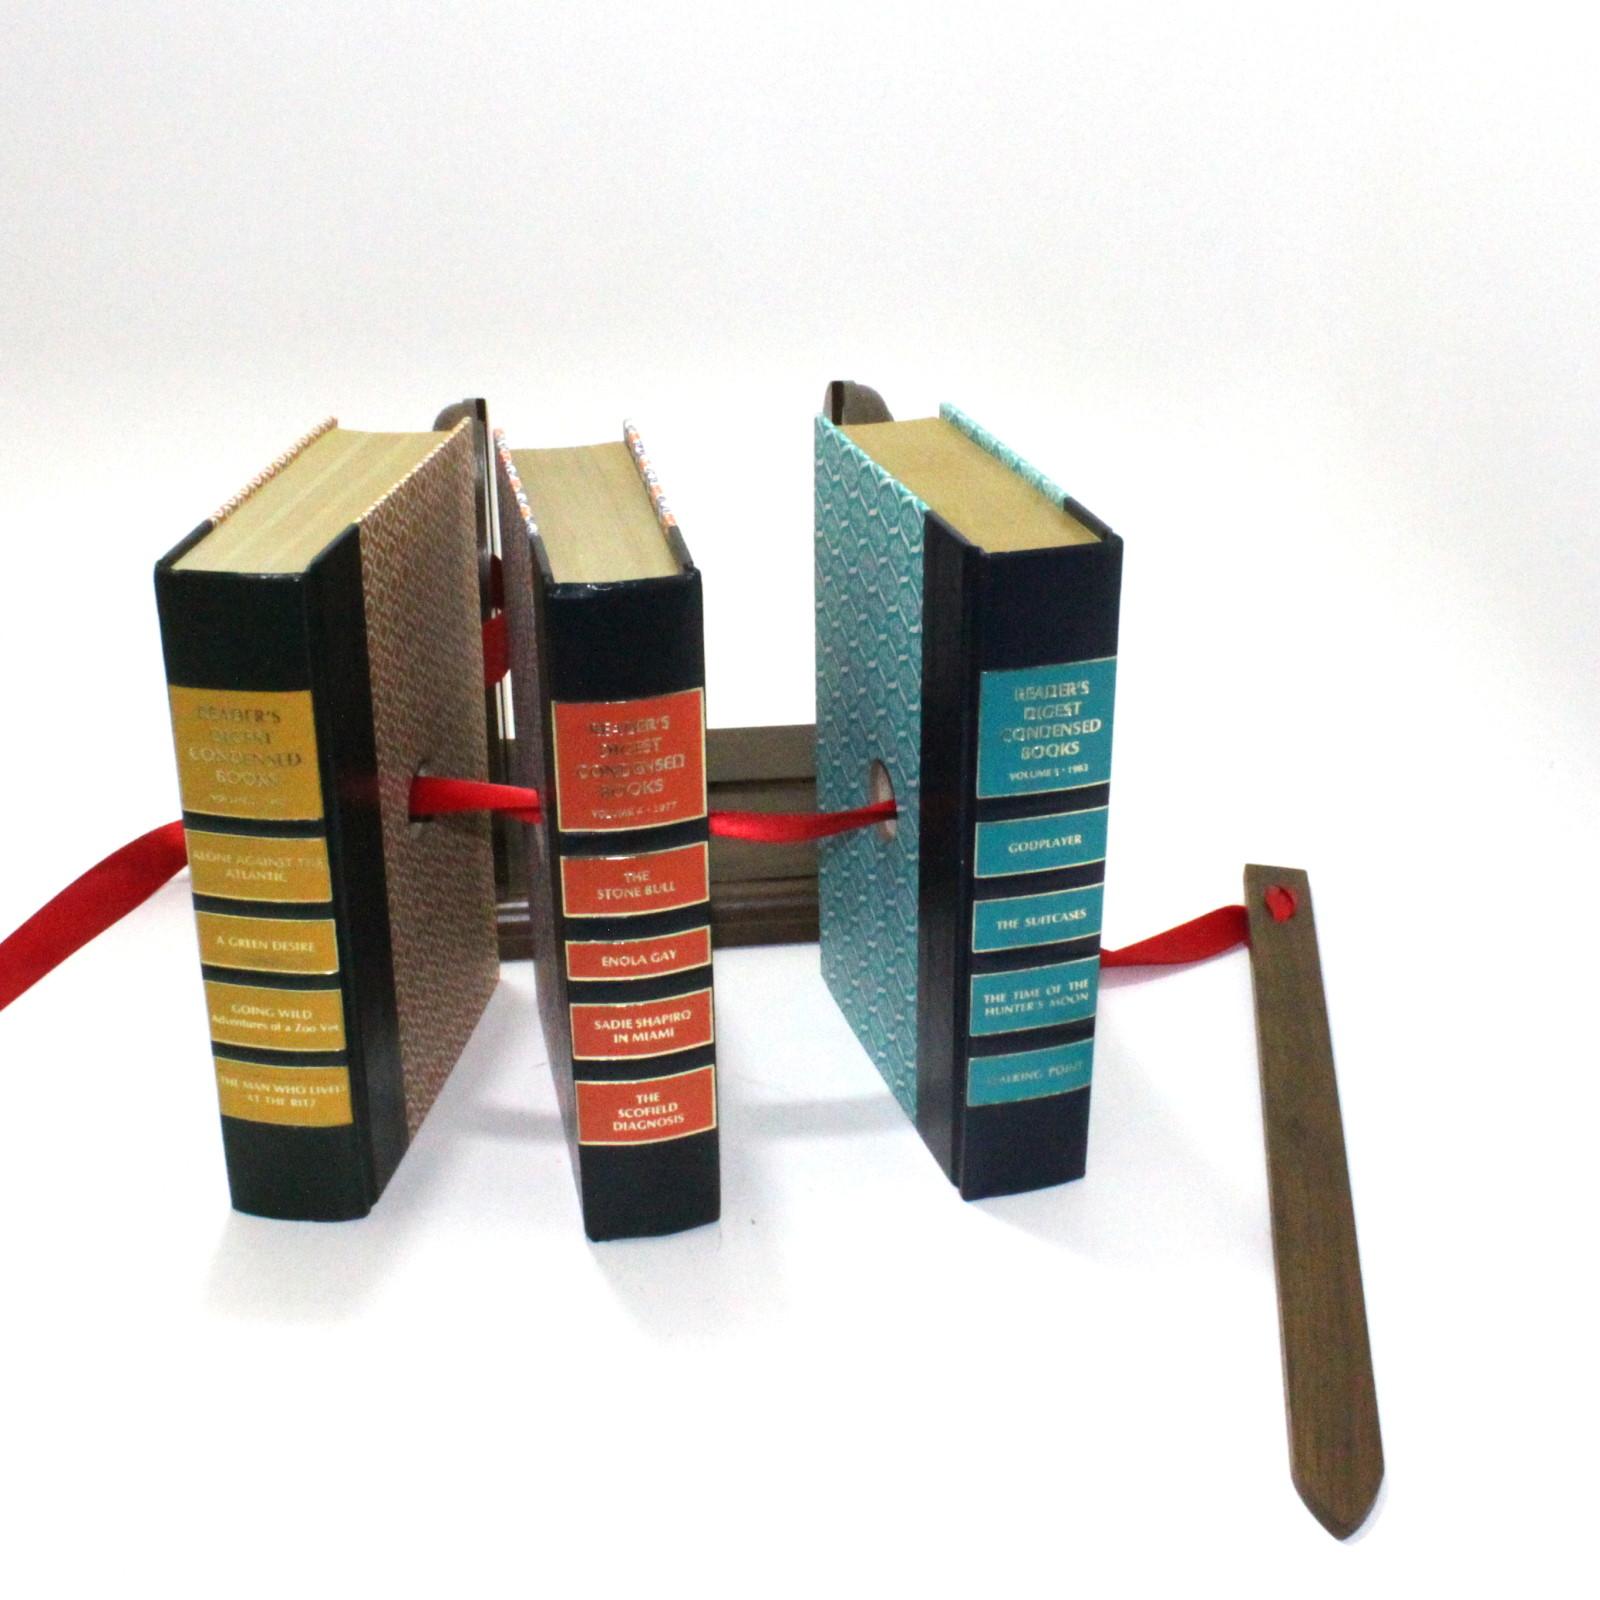 Locked Book Release by Magikraft Studios, Eric Lewis